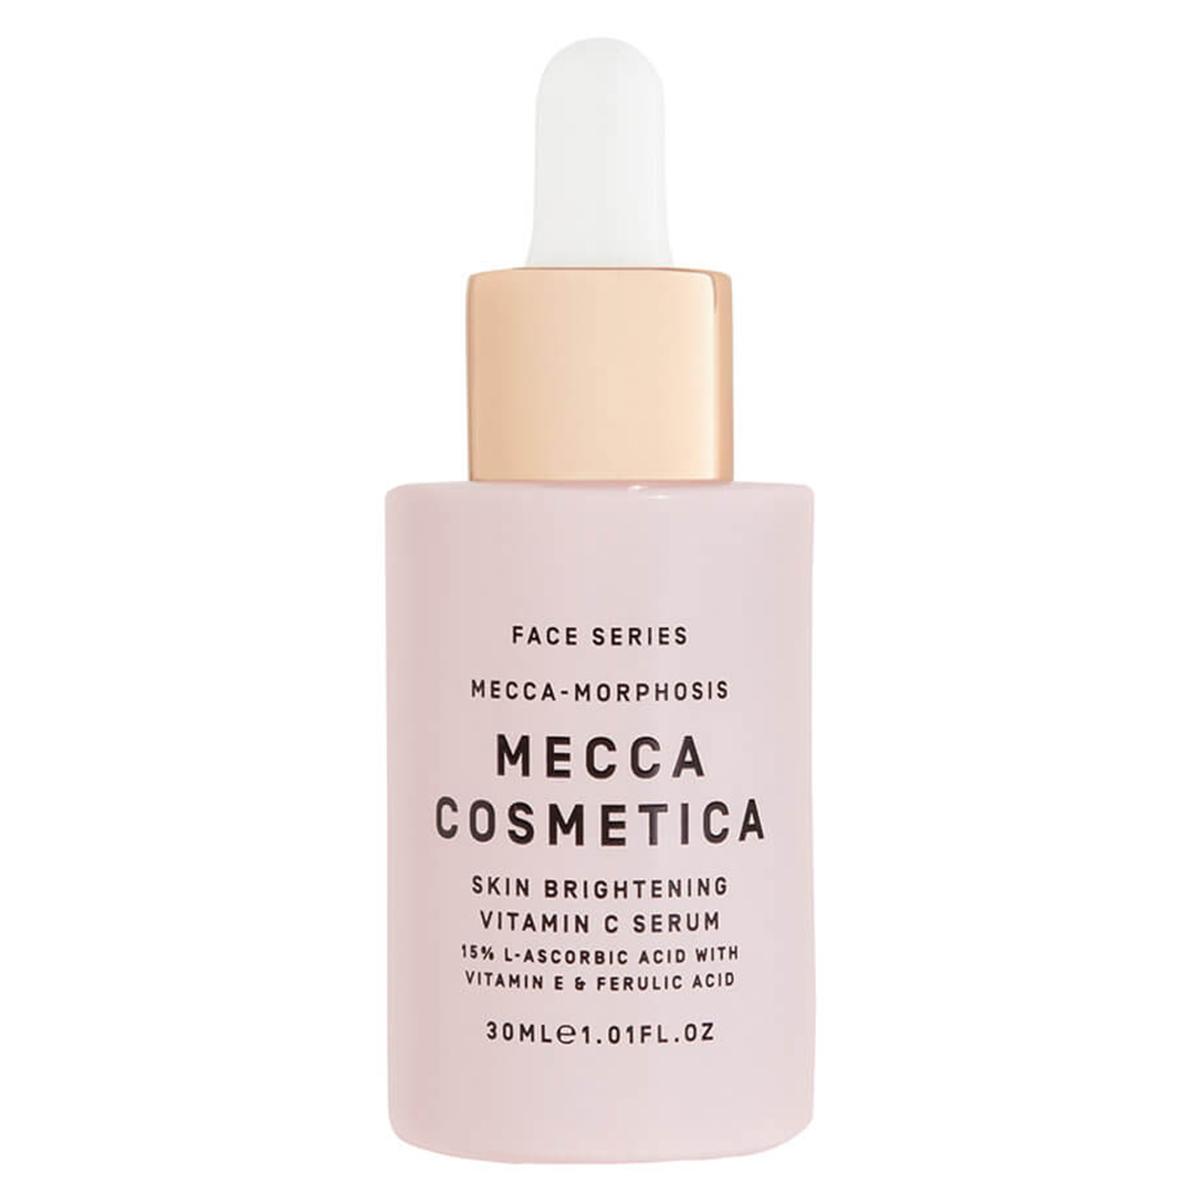 a bottle of mecca serum